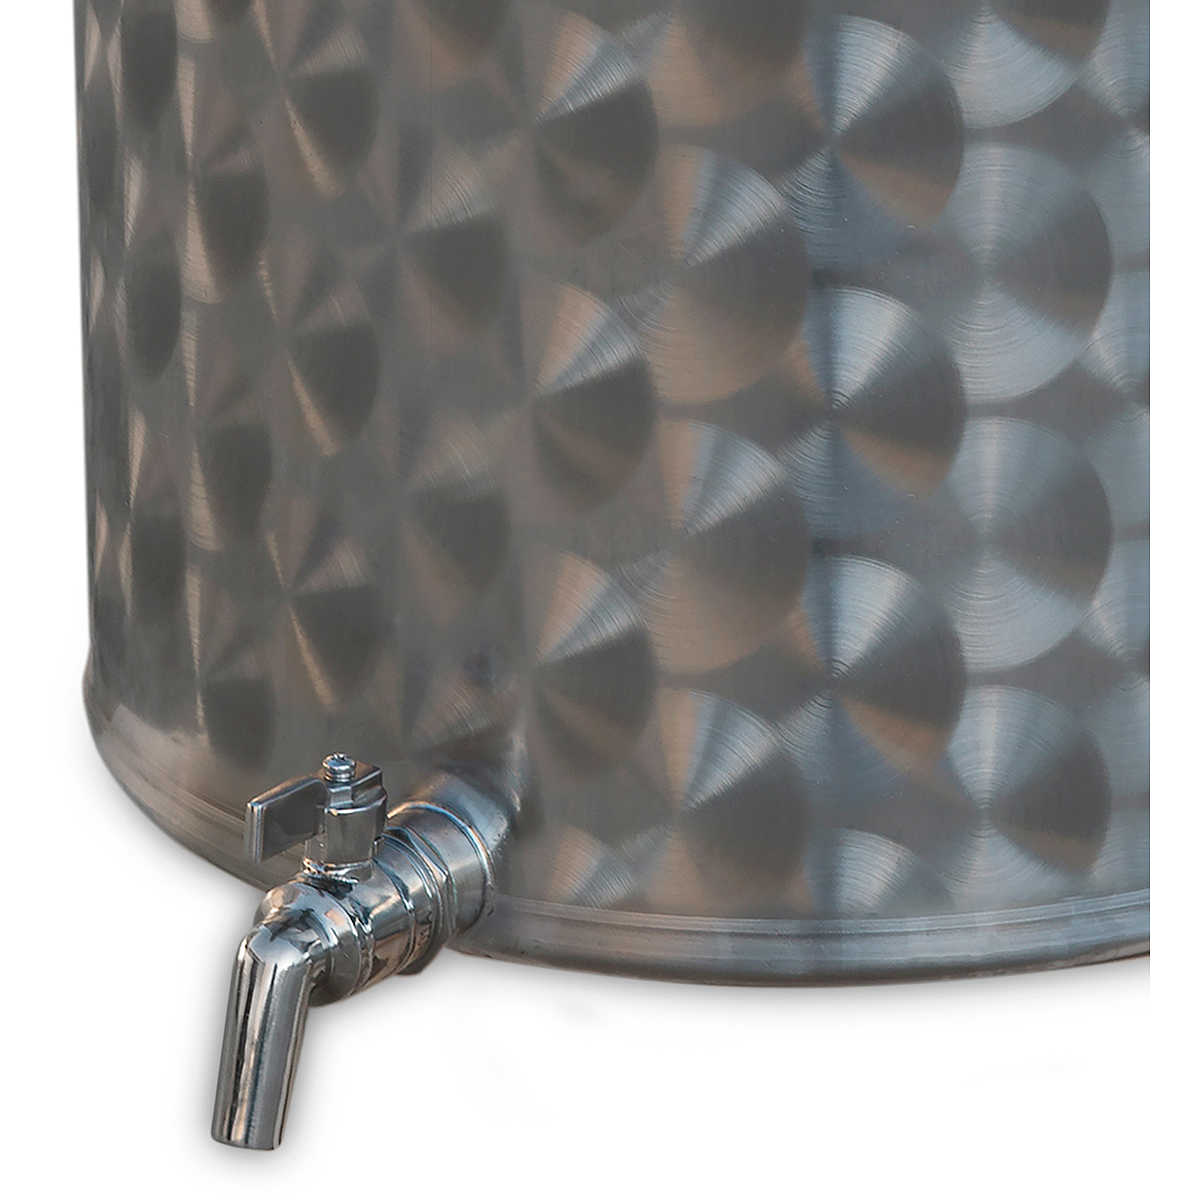 Cuve Inox 25 L Avec Robinet Biere Polsinelli Enologia